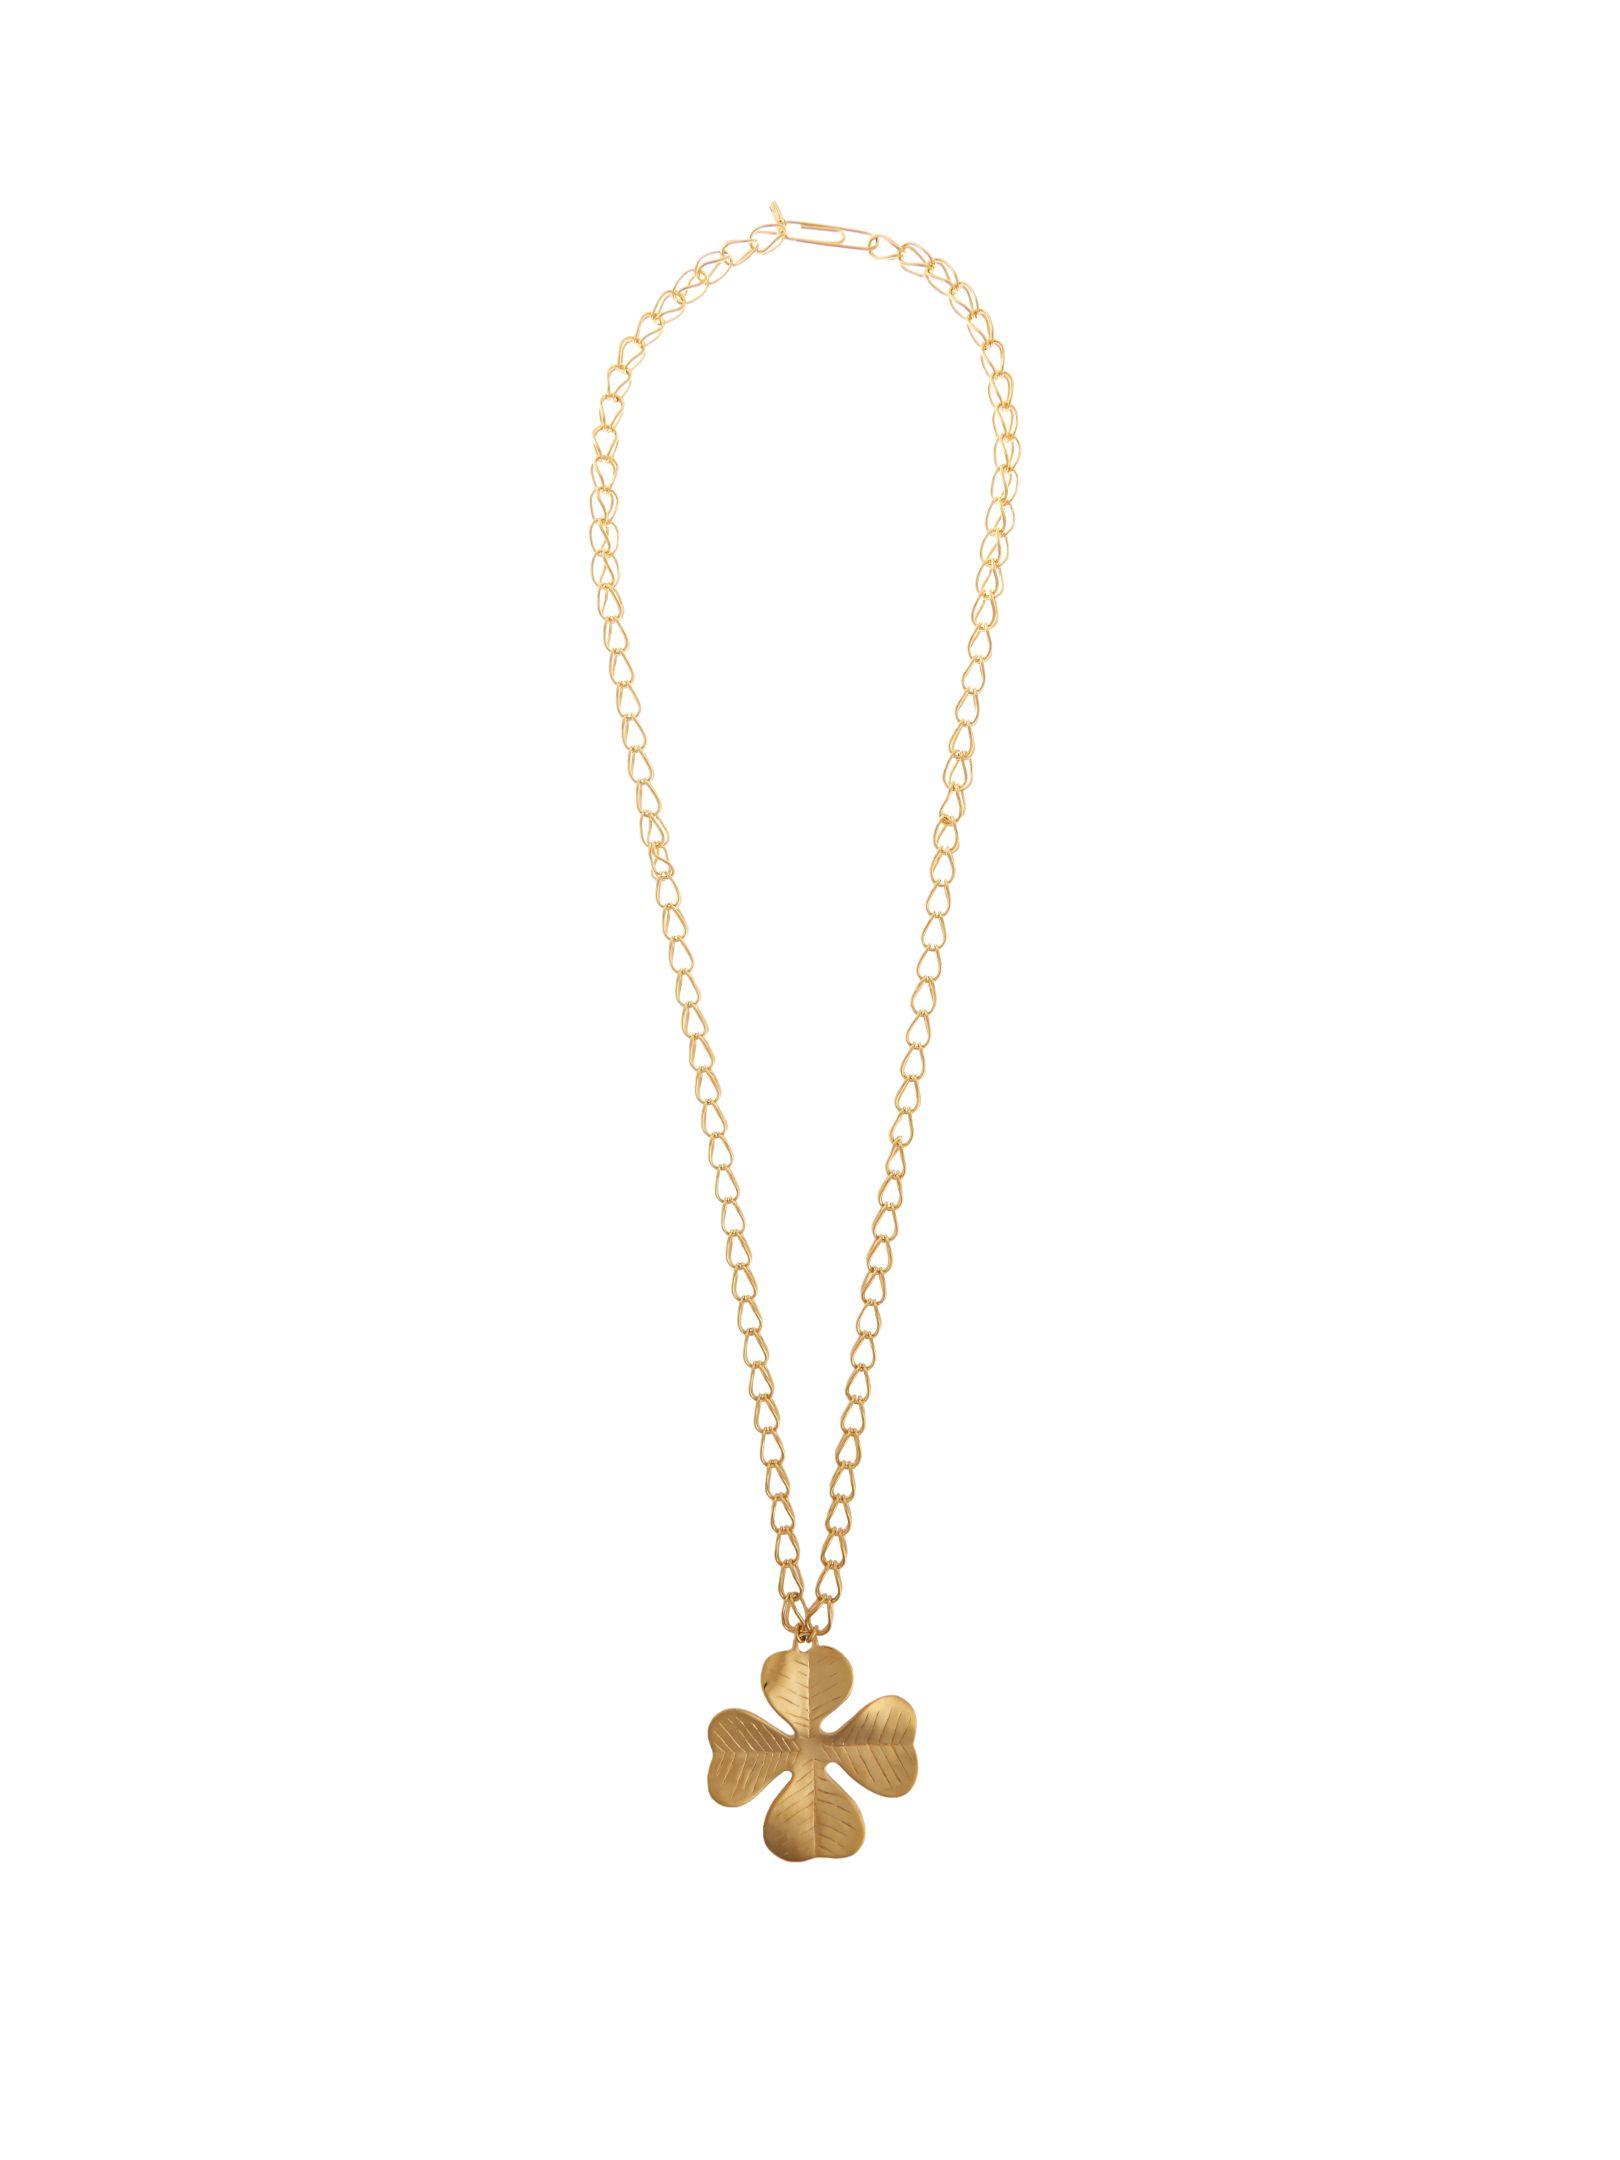 Aurélie Bidermann Aurélie Bidermann Woman Hammered Gold-tone Necklace Gold Size PR3B8U1